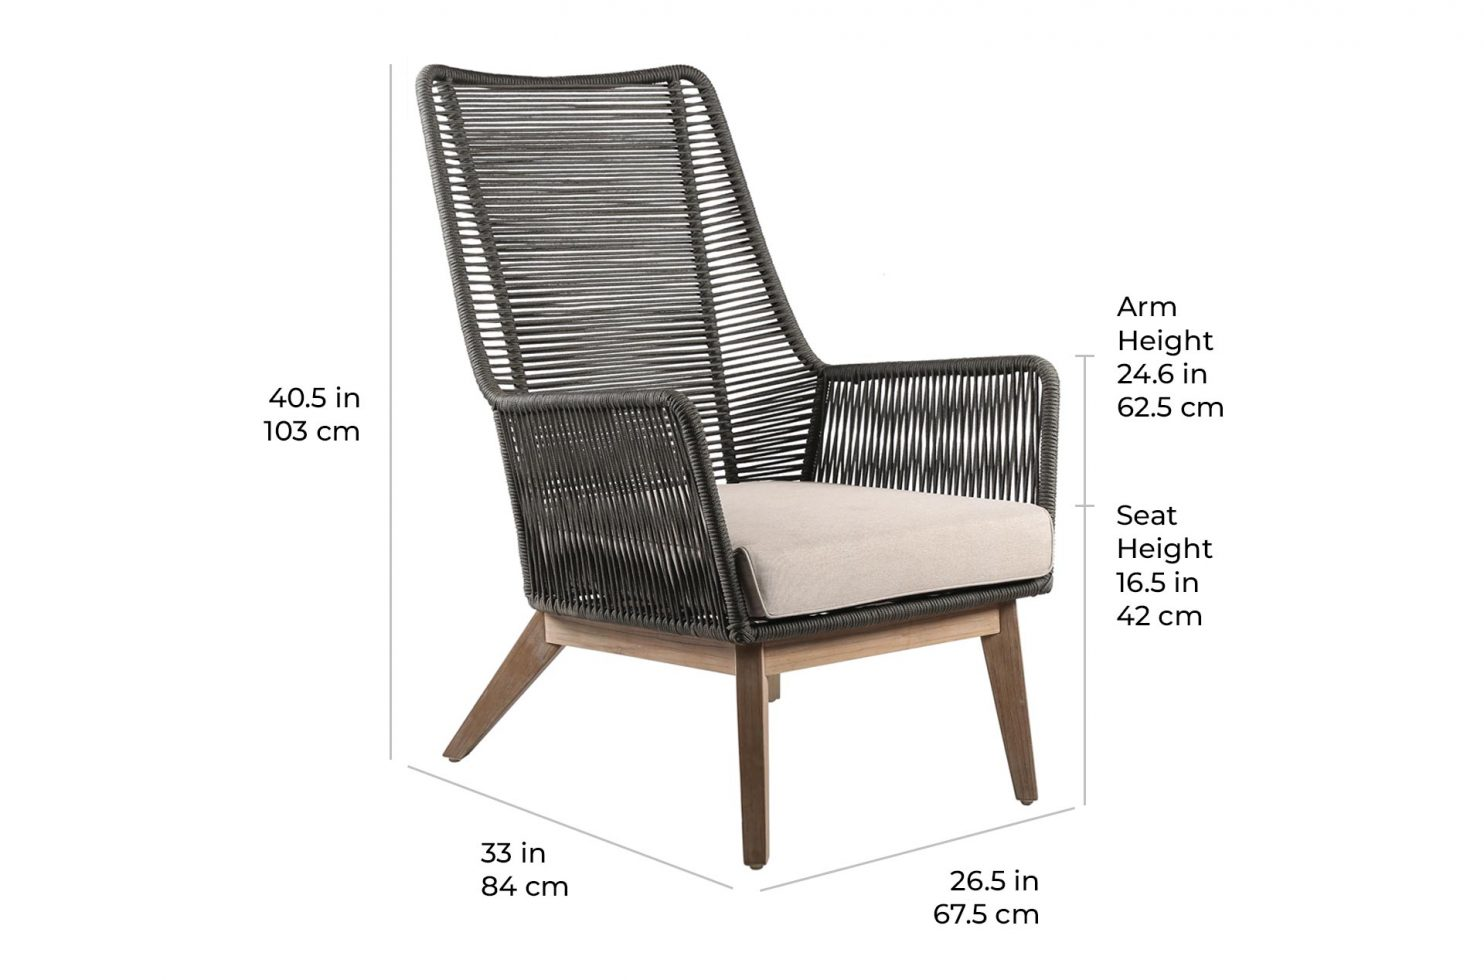 marco polo lounge chair E50499415 scale dims